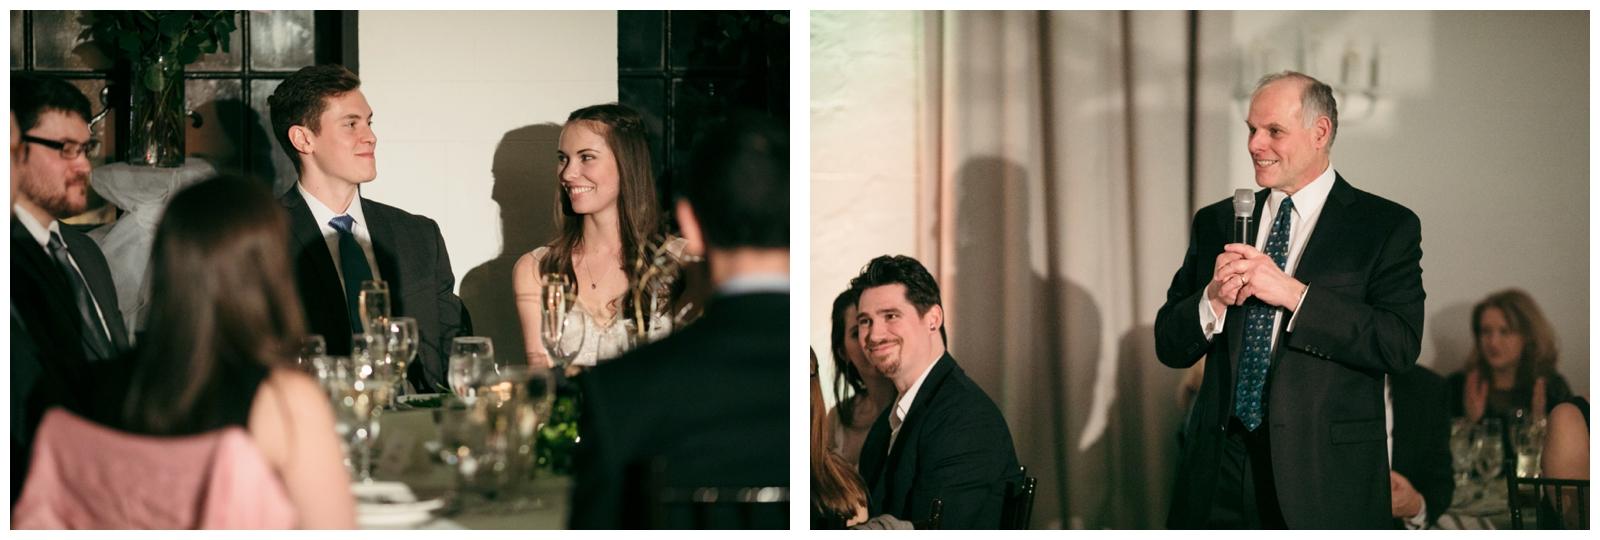 Alden-Castle-Wedding-Boston-Bailey-Q-Photo-048.jpg